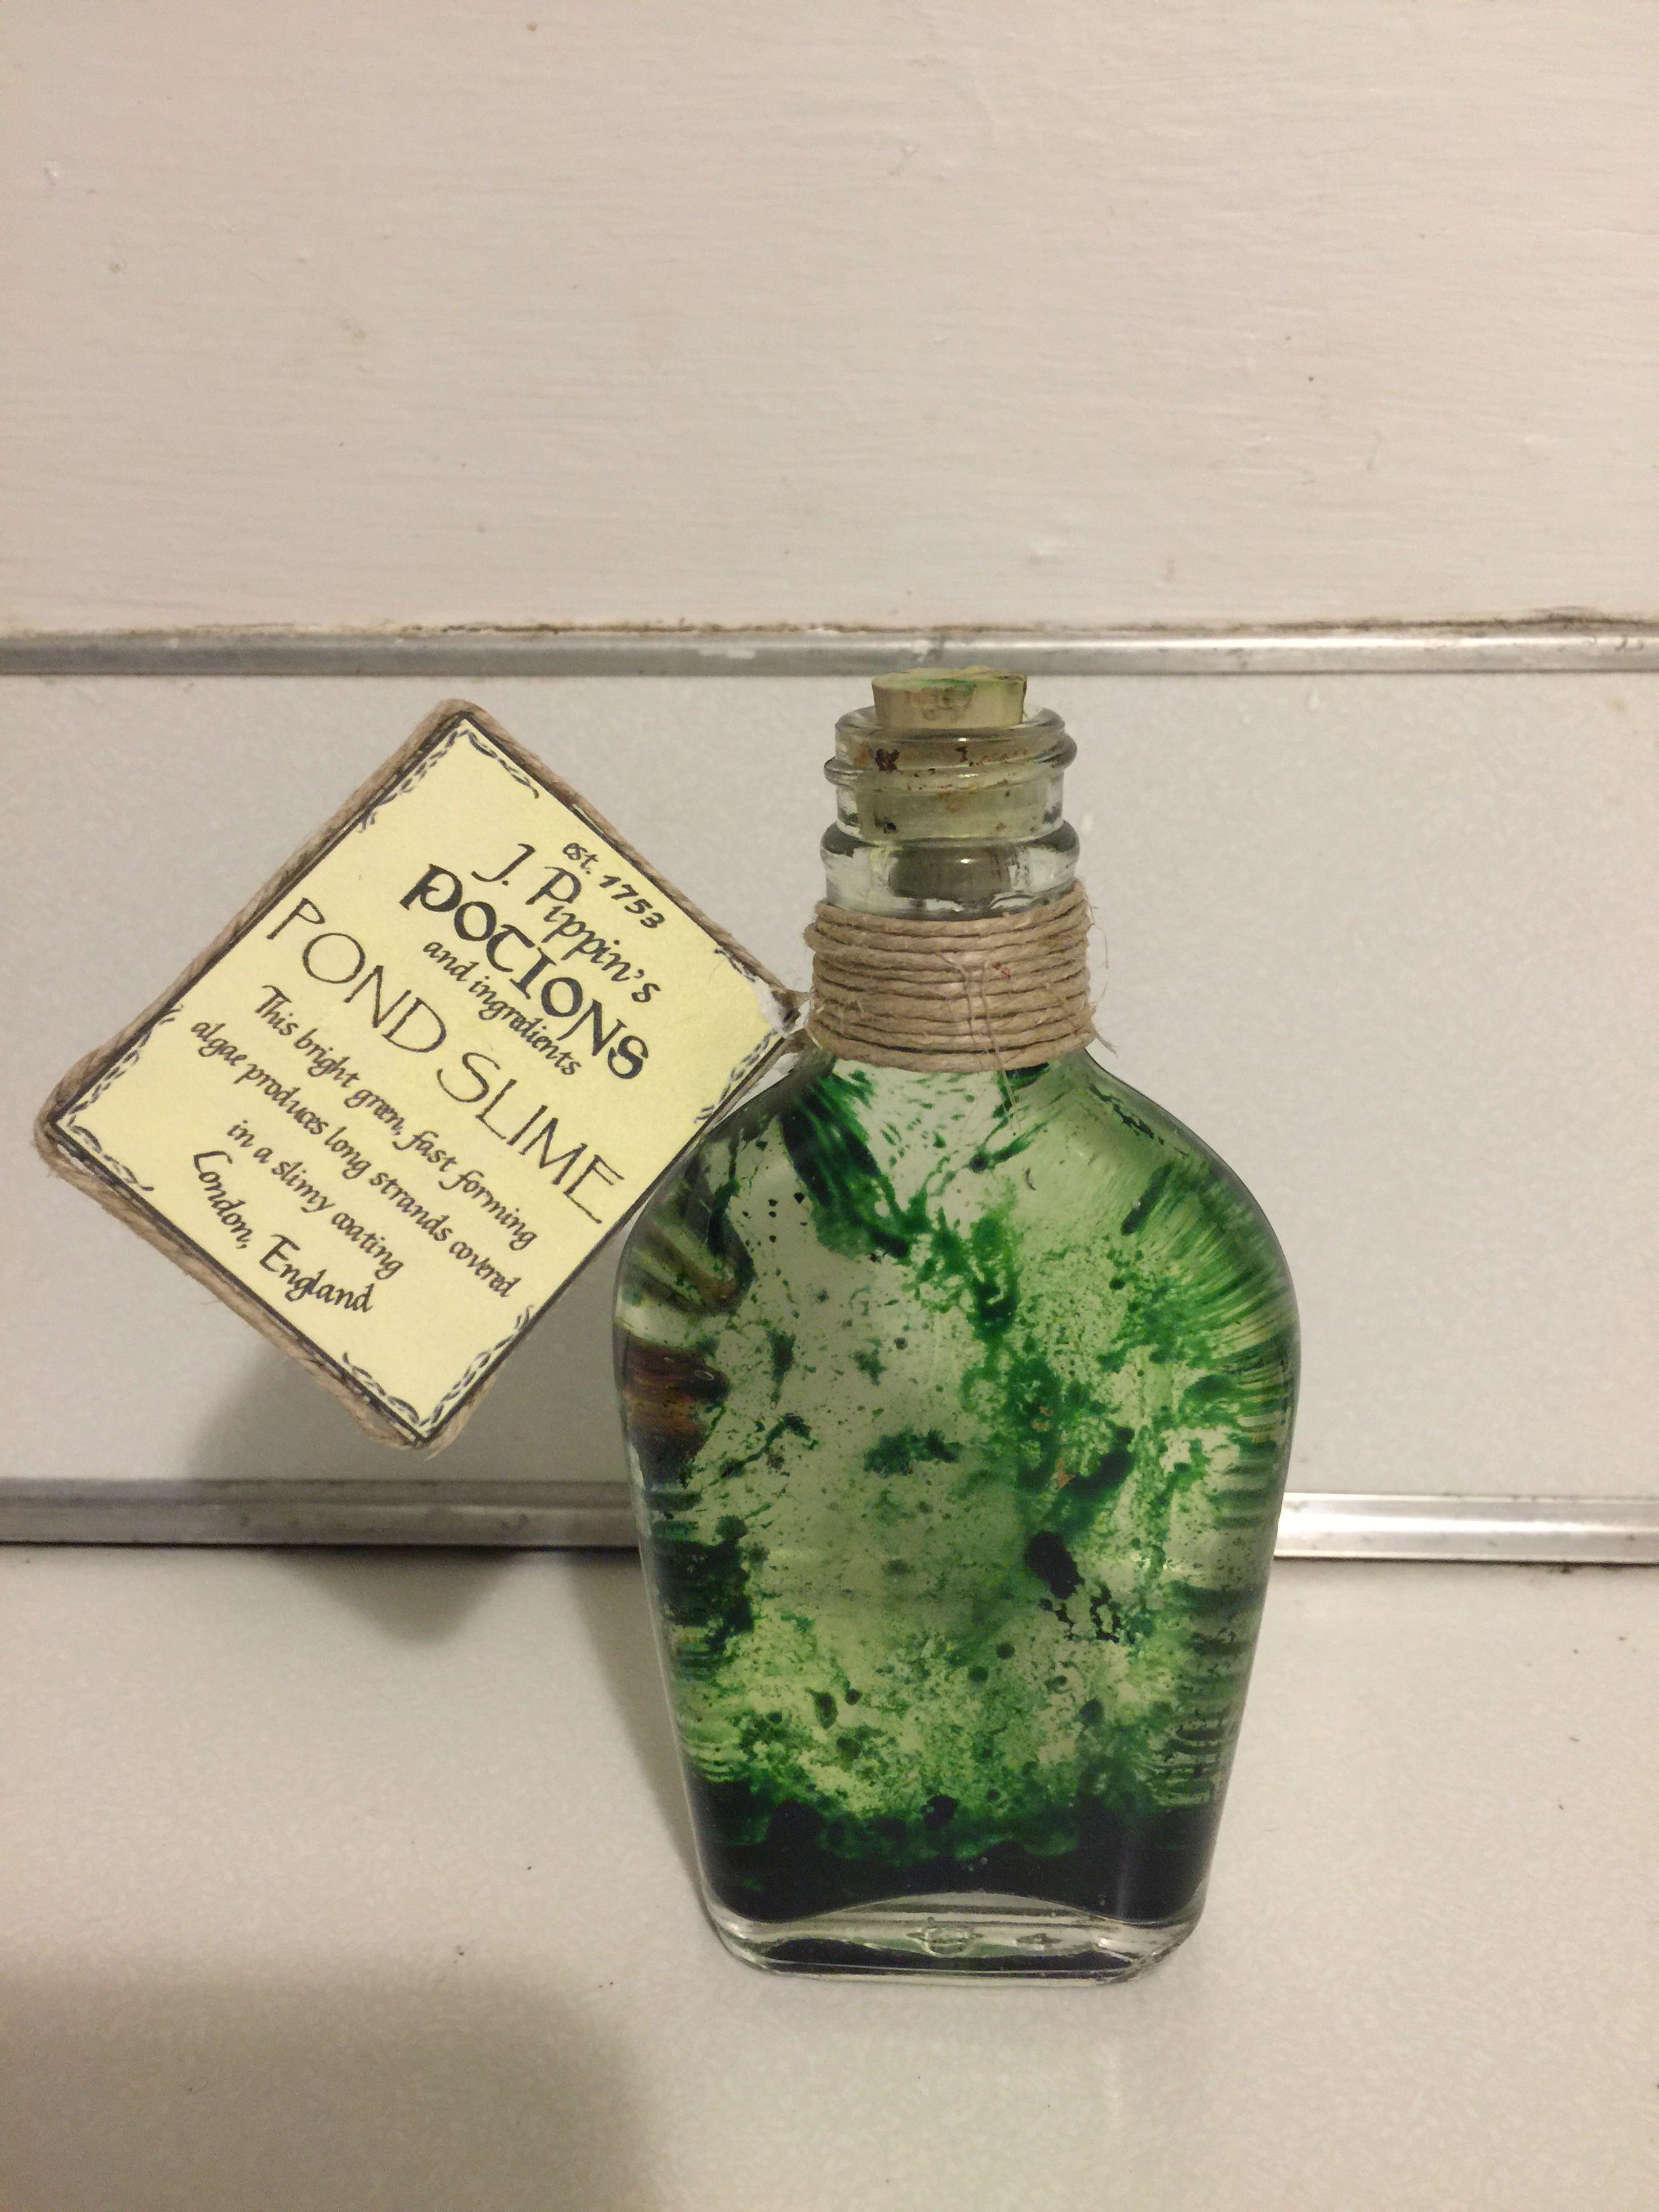 How To Make Slime With Vegetable Oil : slime, vegetable, Slime., Vegetable, Coloring, #HarryPotter, #Potions, Harry, Potter, Bottle,